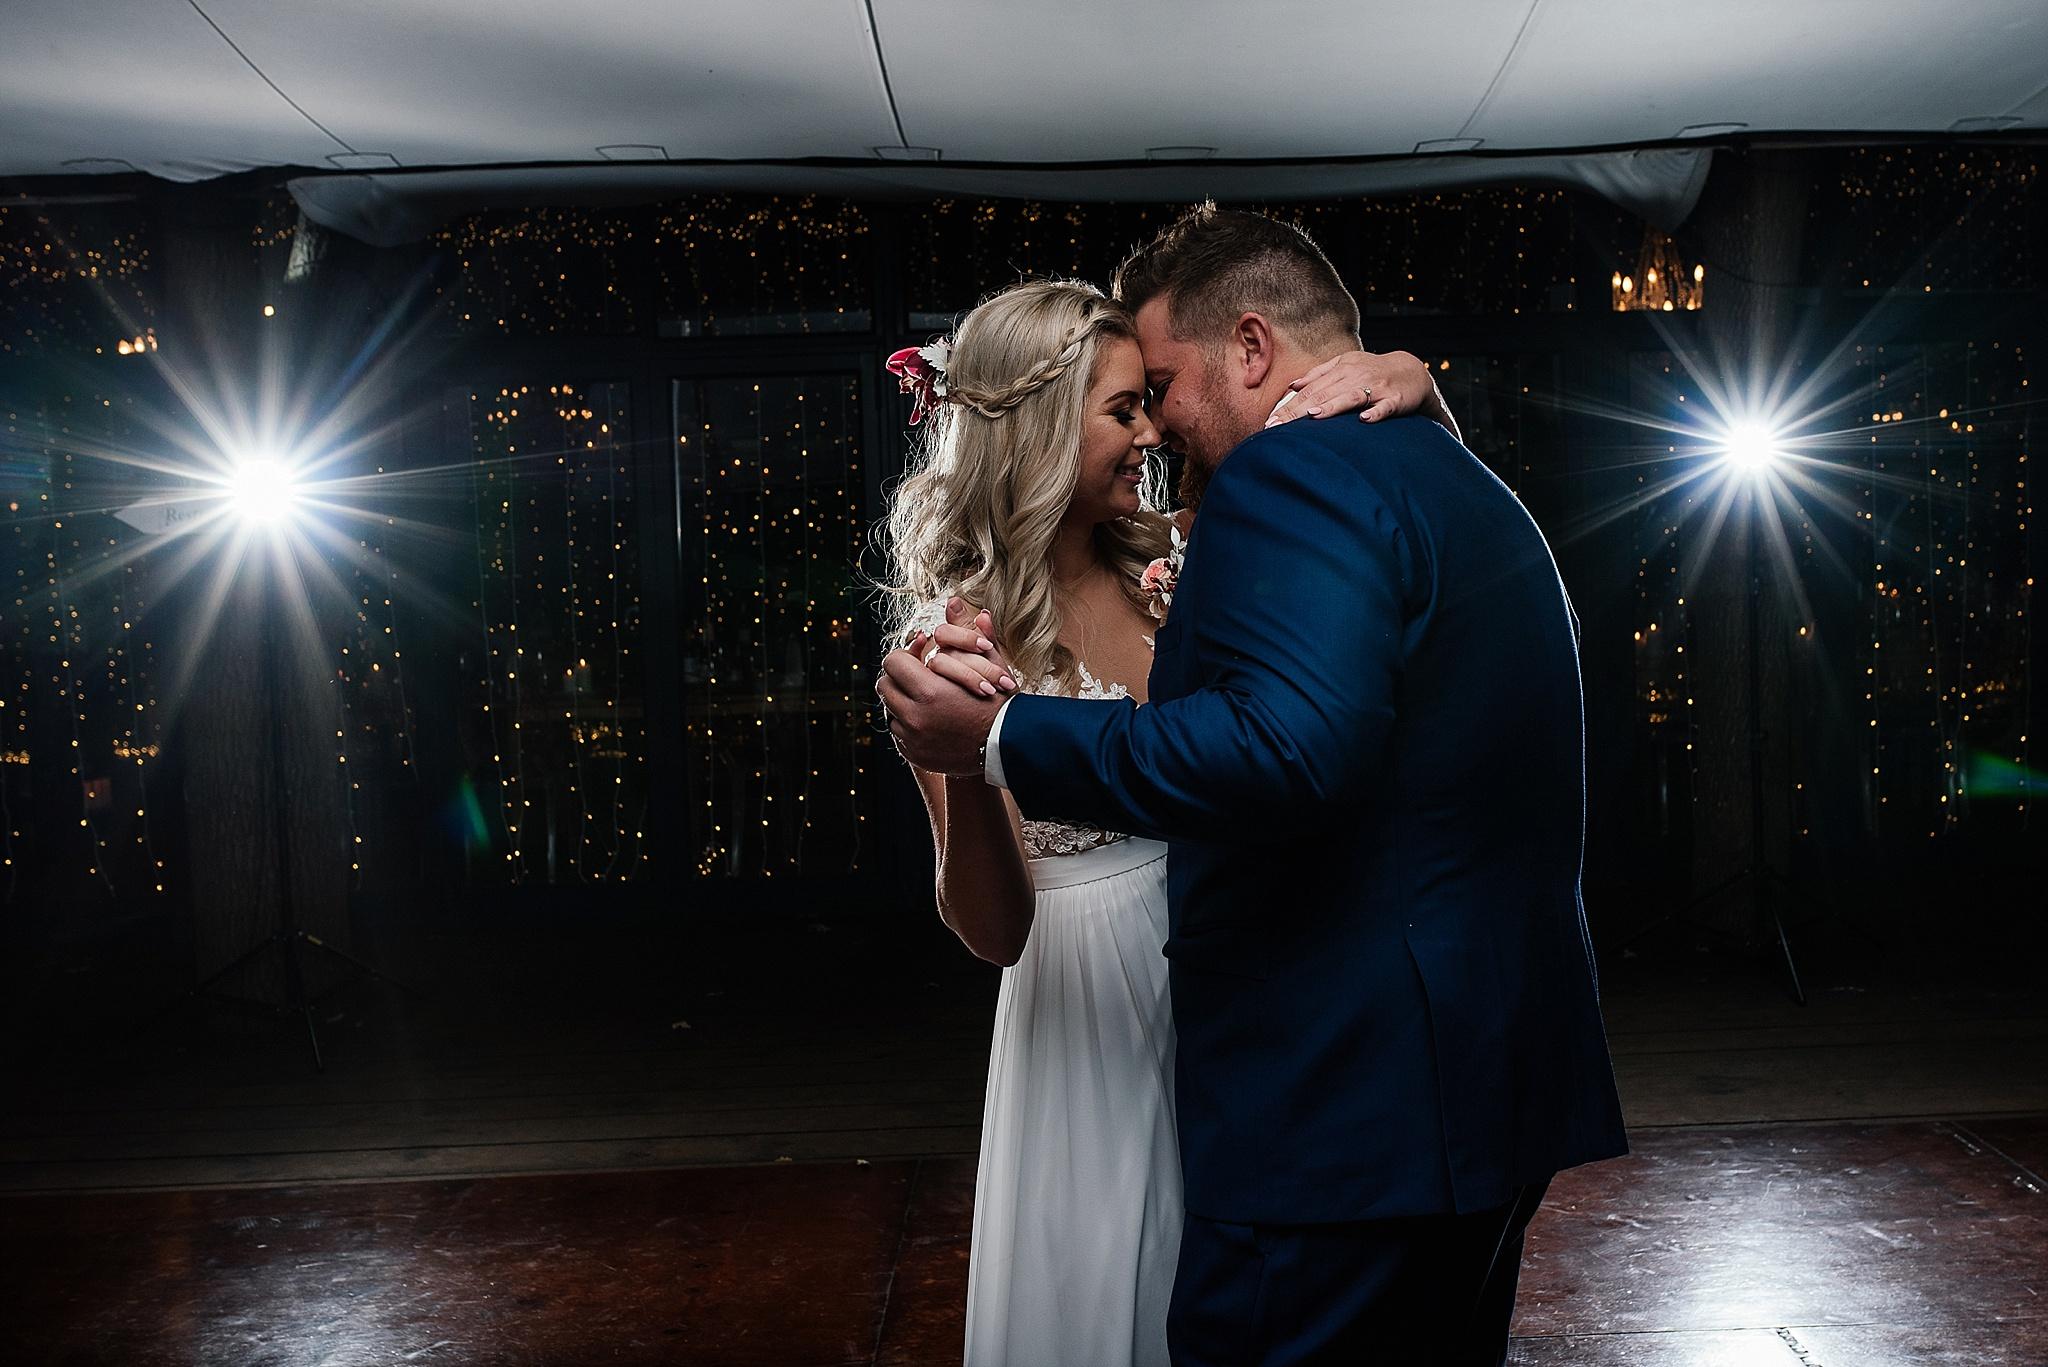 Cape Town Photographer Darren Bester - Die Woud Wedding - Gareth & Roxanne_0056.jpg